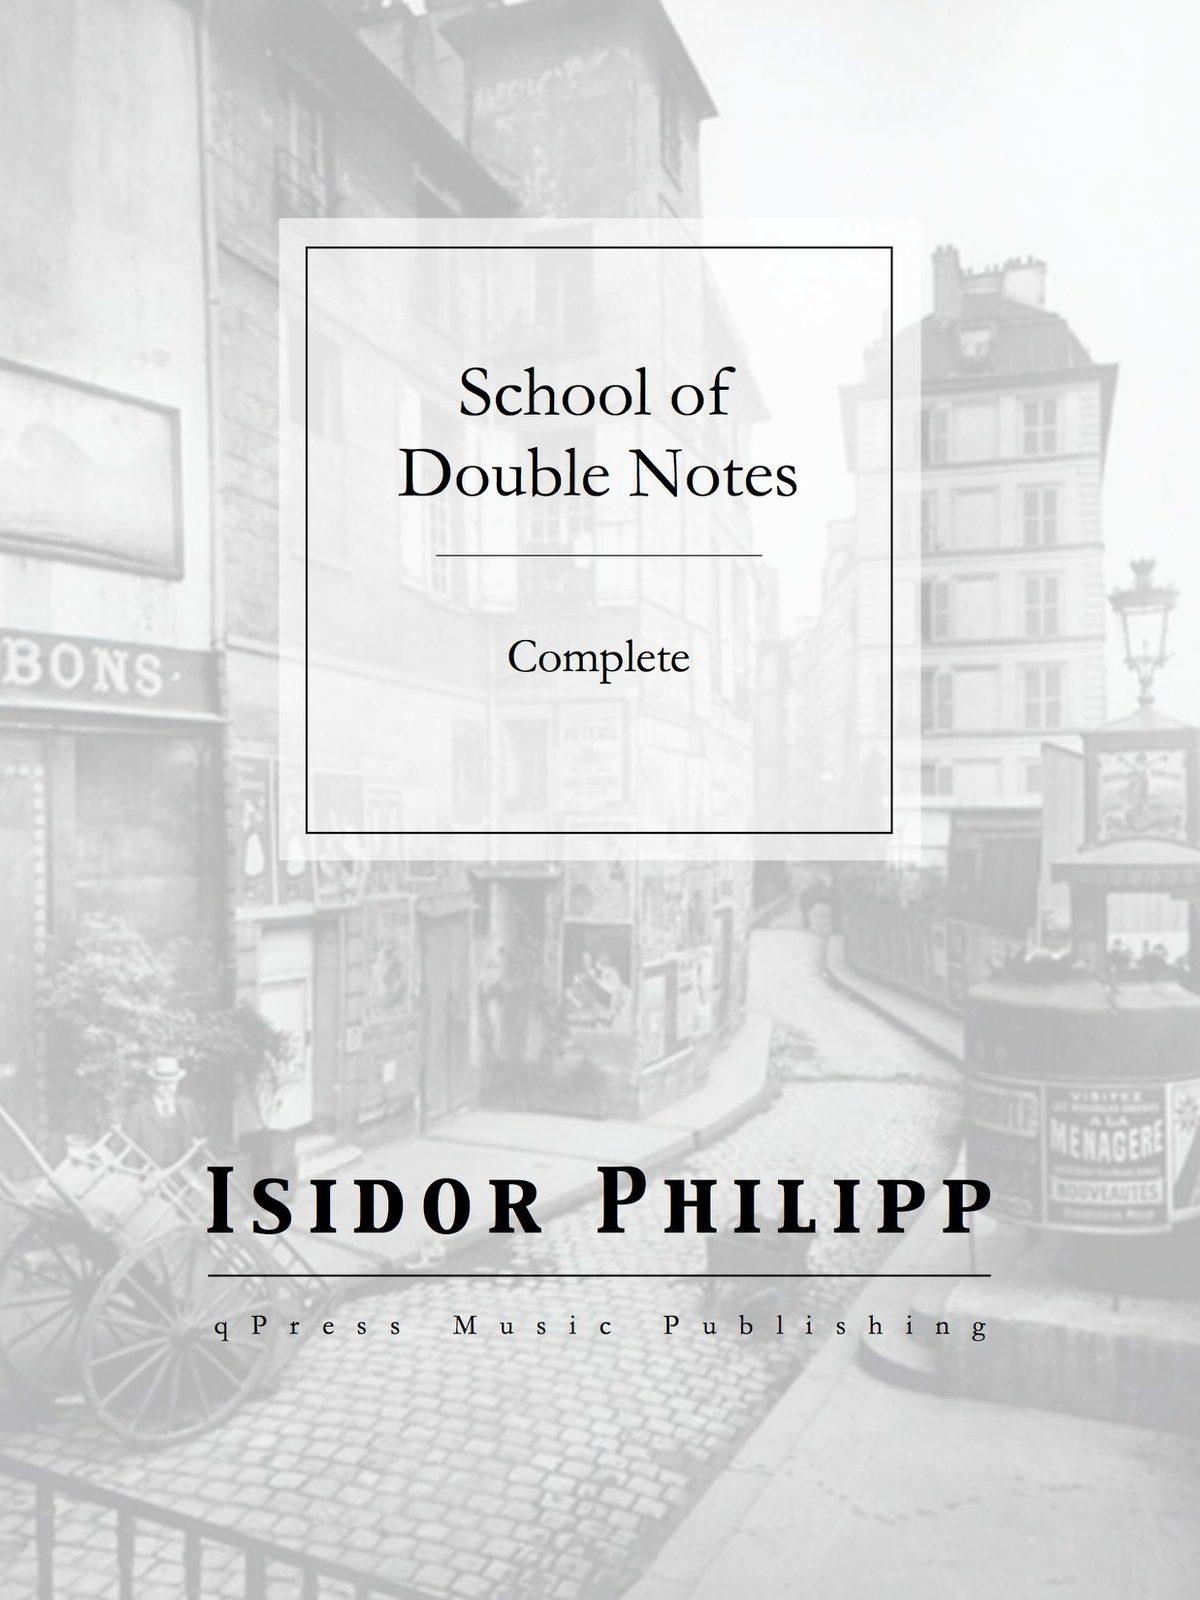 Philipp, School of Double Notes Complete-p001